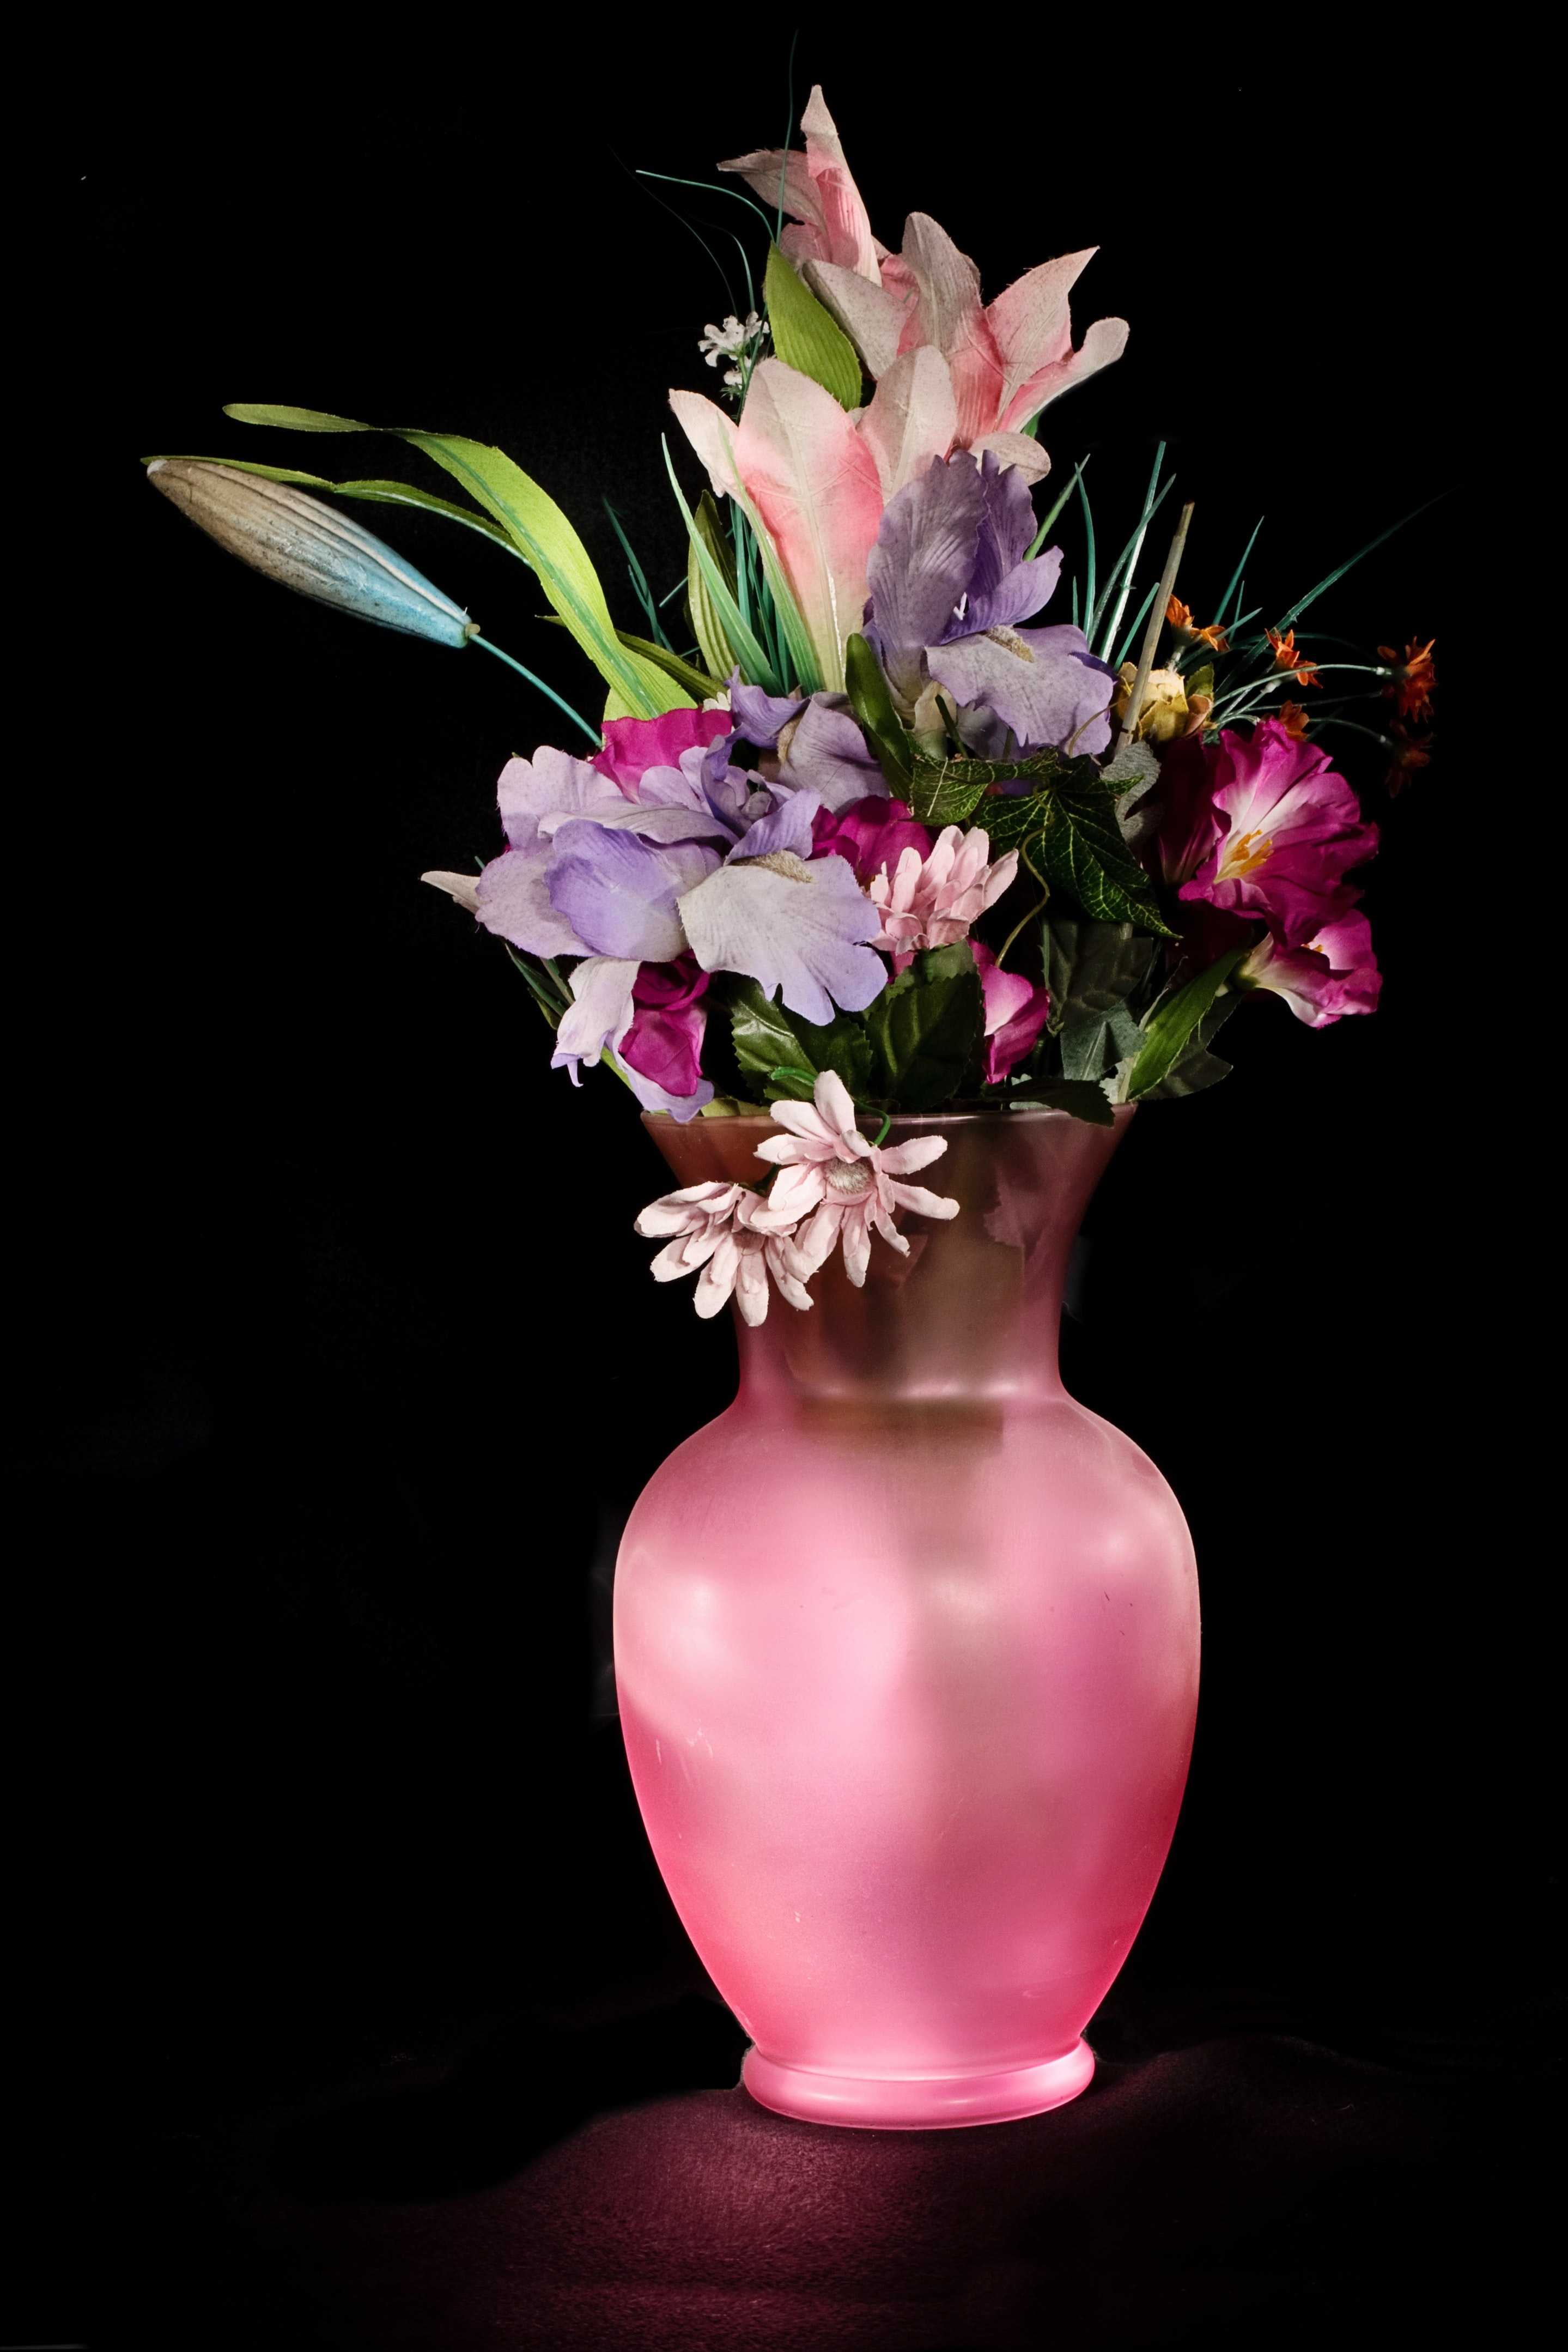 flower vase Photos & 1000+ Interesting Flower Vase Photos · Pexels · Free Stock Photos